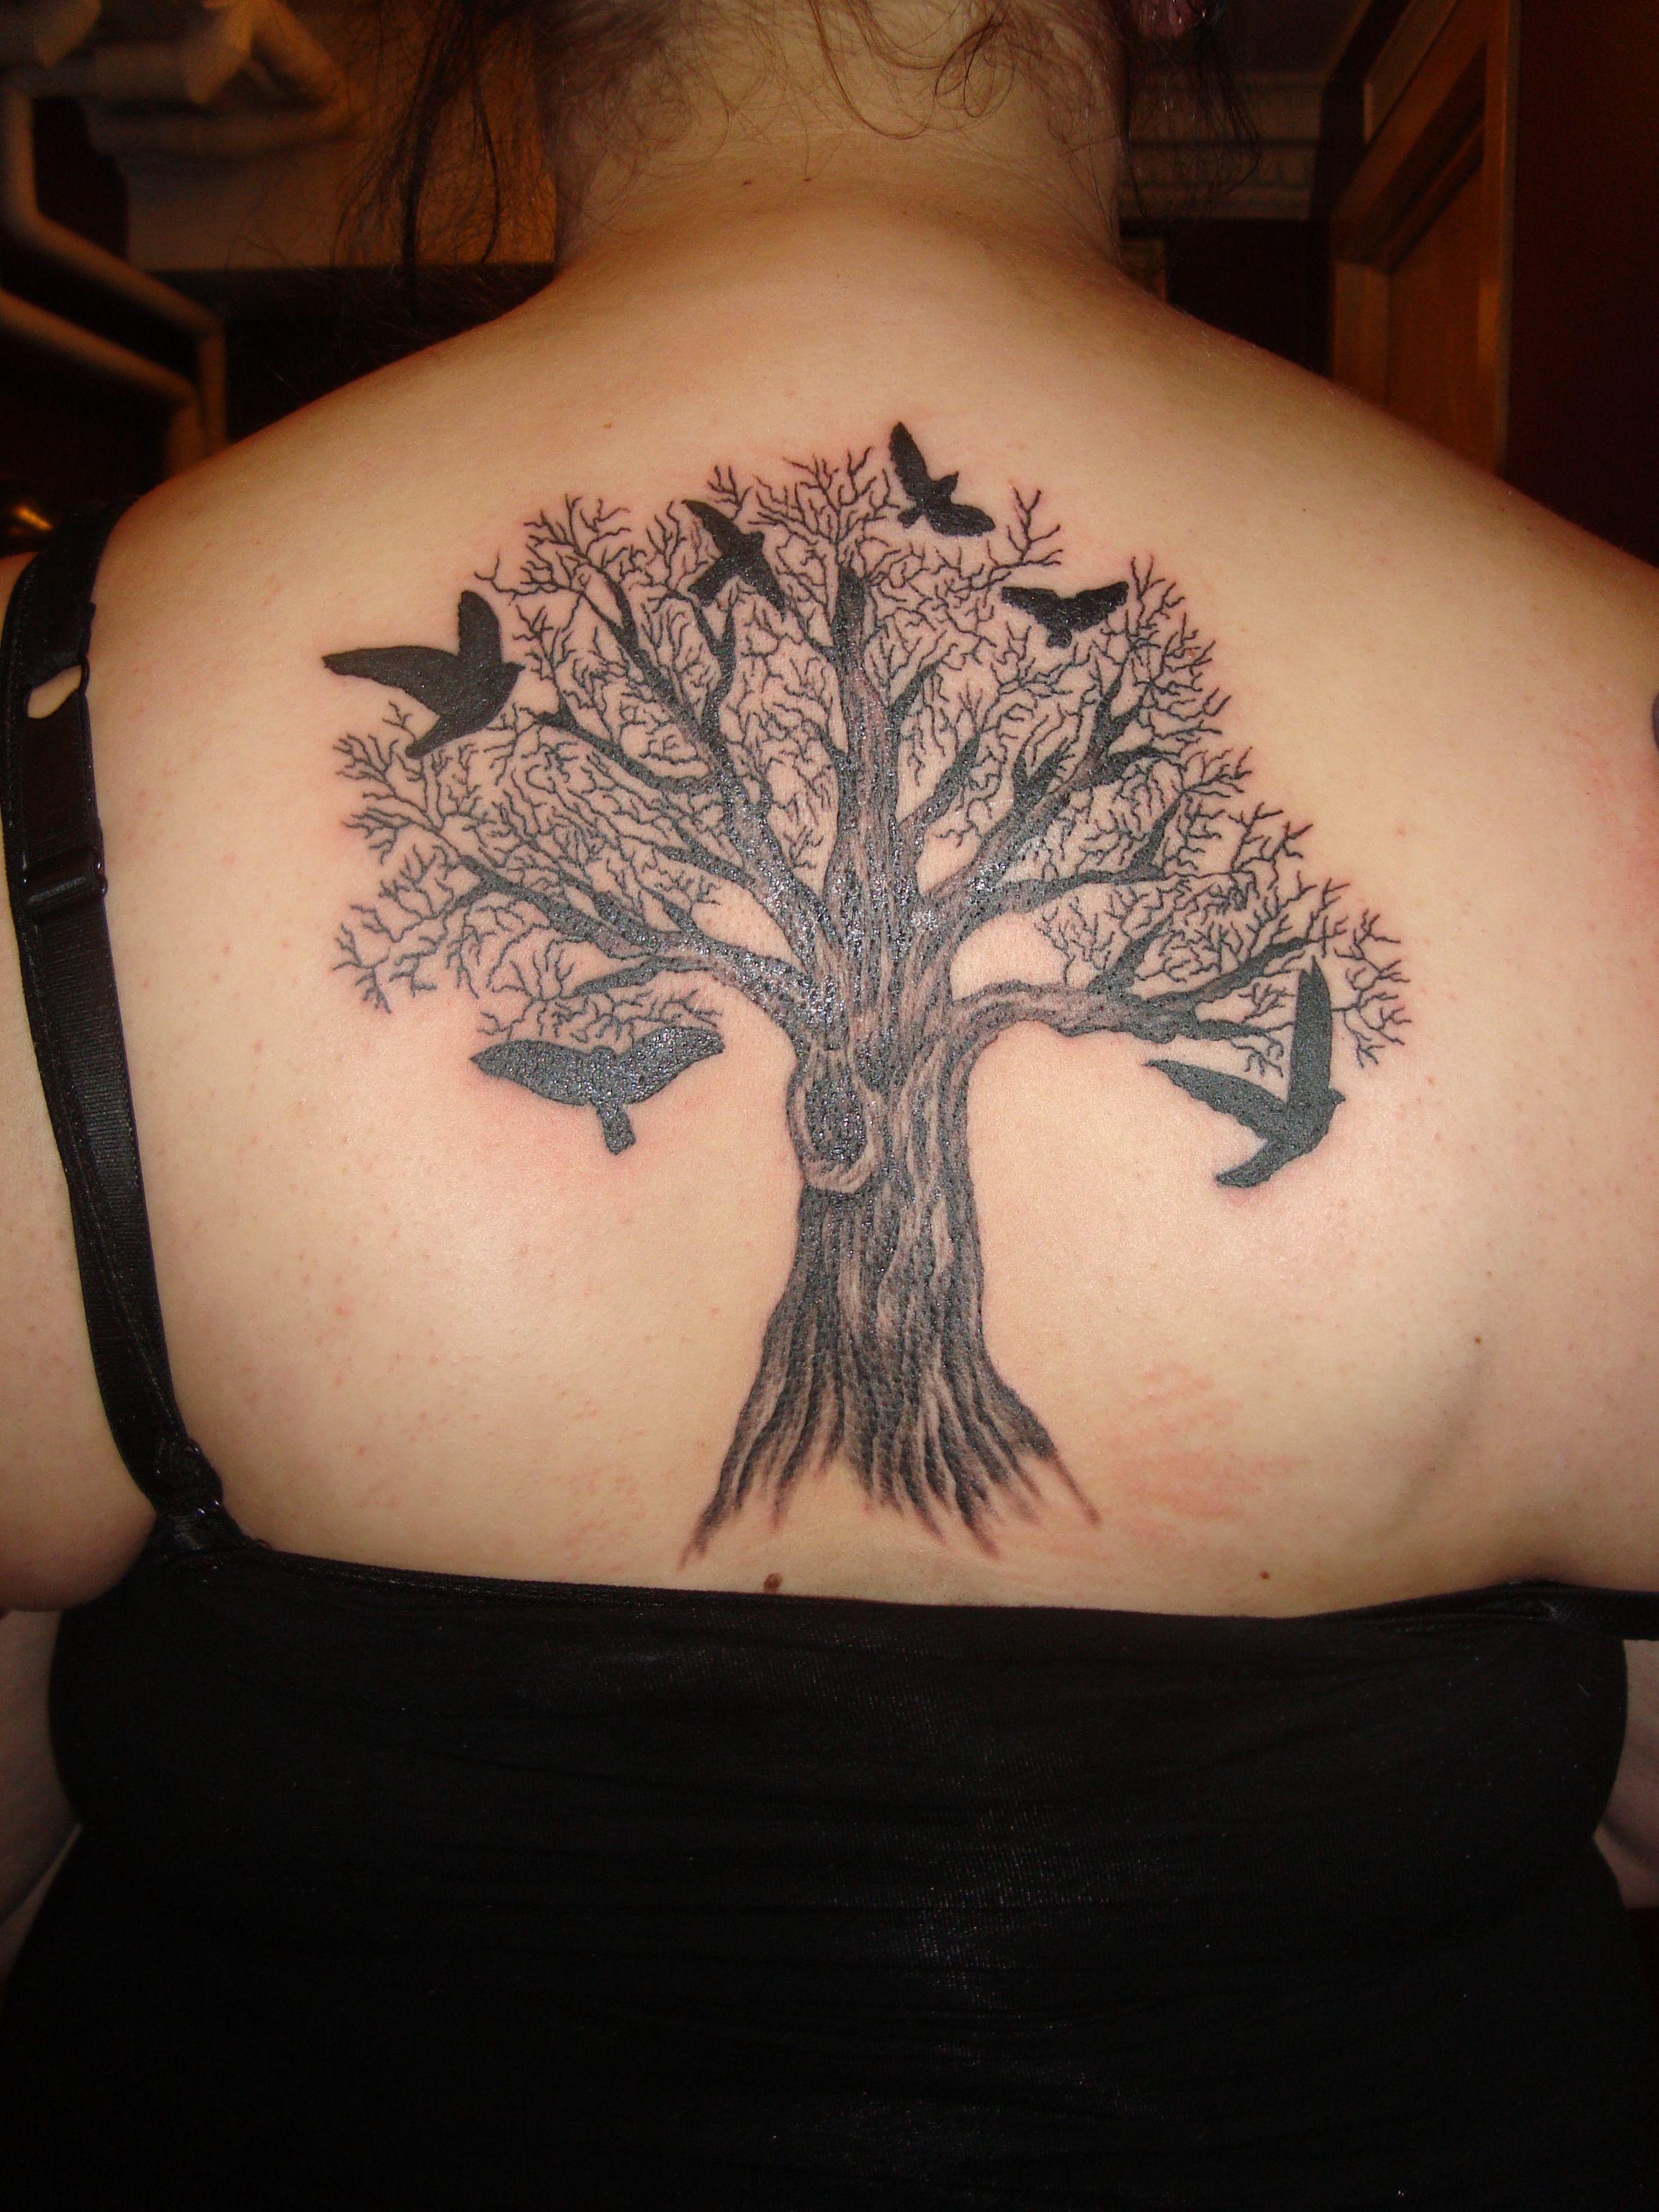 Tattoos for men family family tree tattoo designs  tattoo  pinterest  tree tattoo